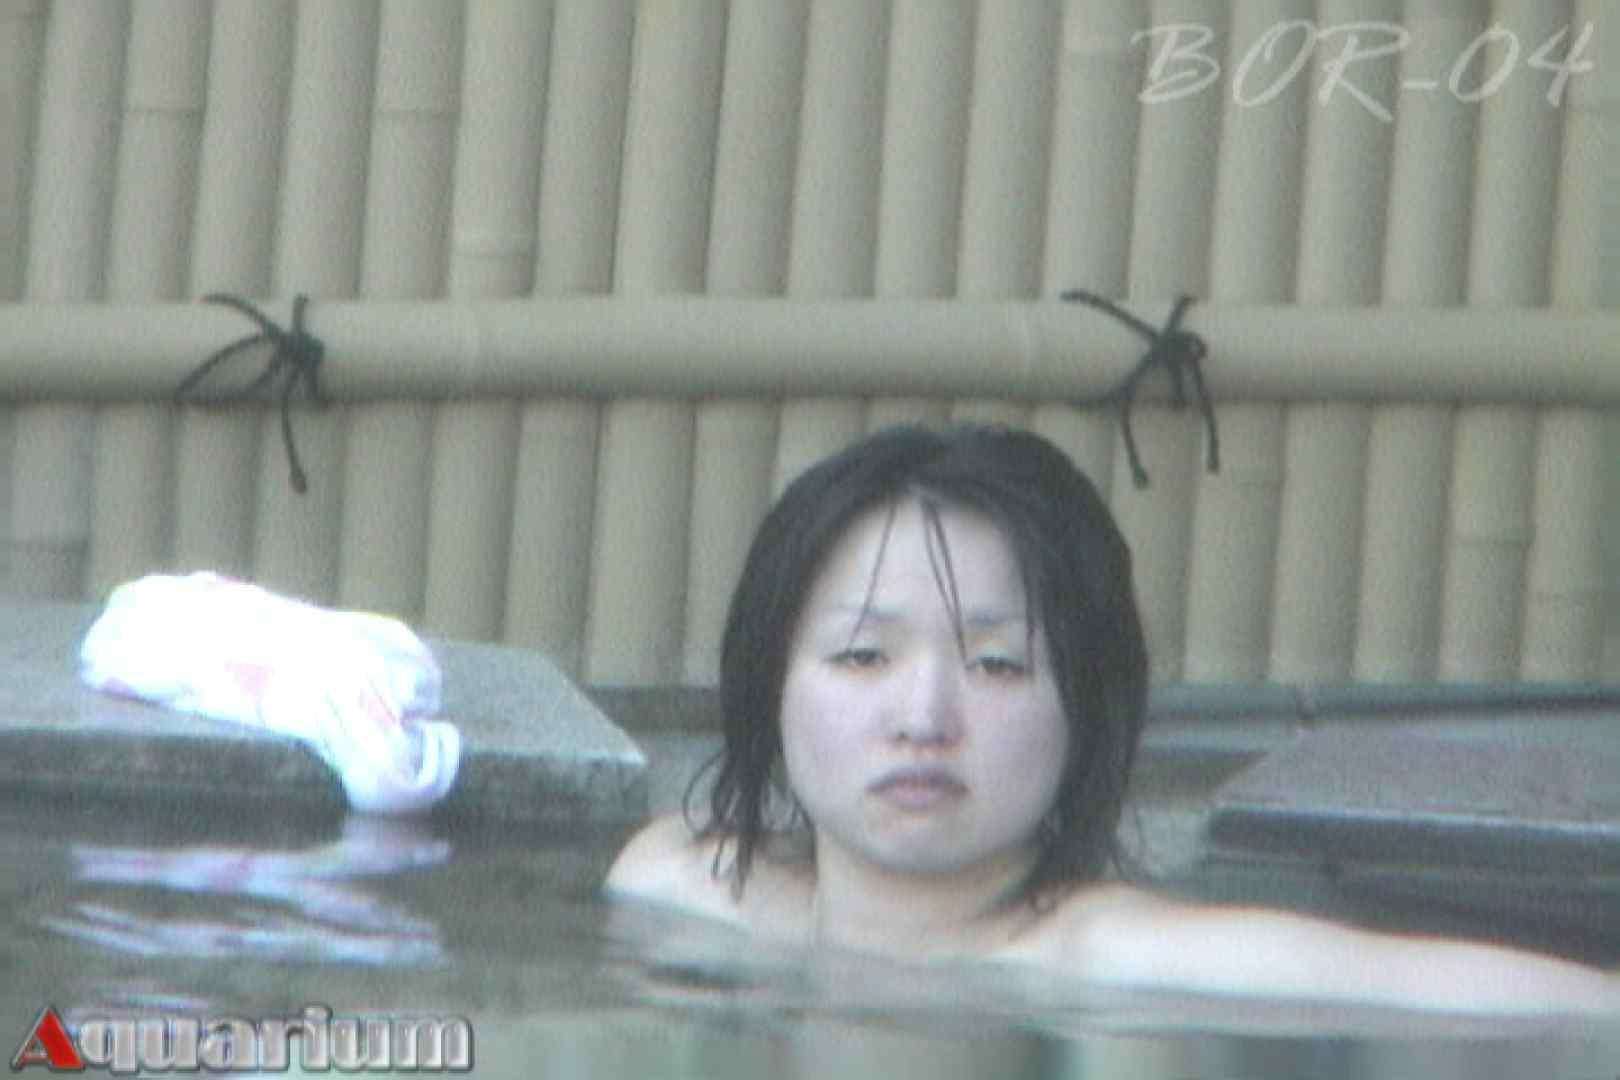 Aquaな露天風呂Vol.513 OL女体 | 露天  77連発 19